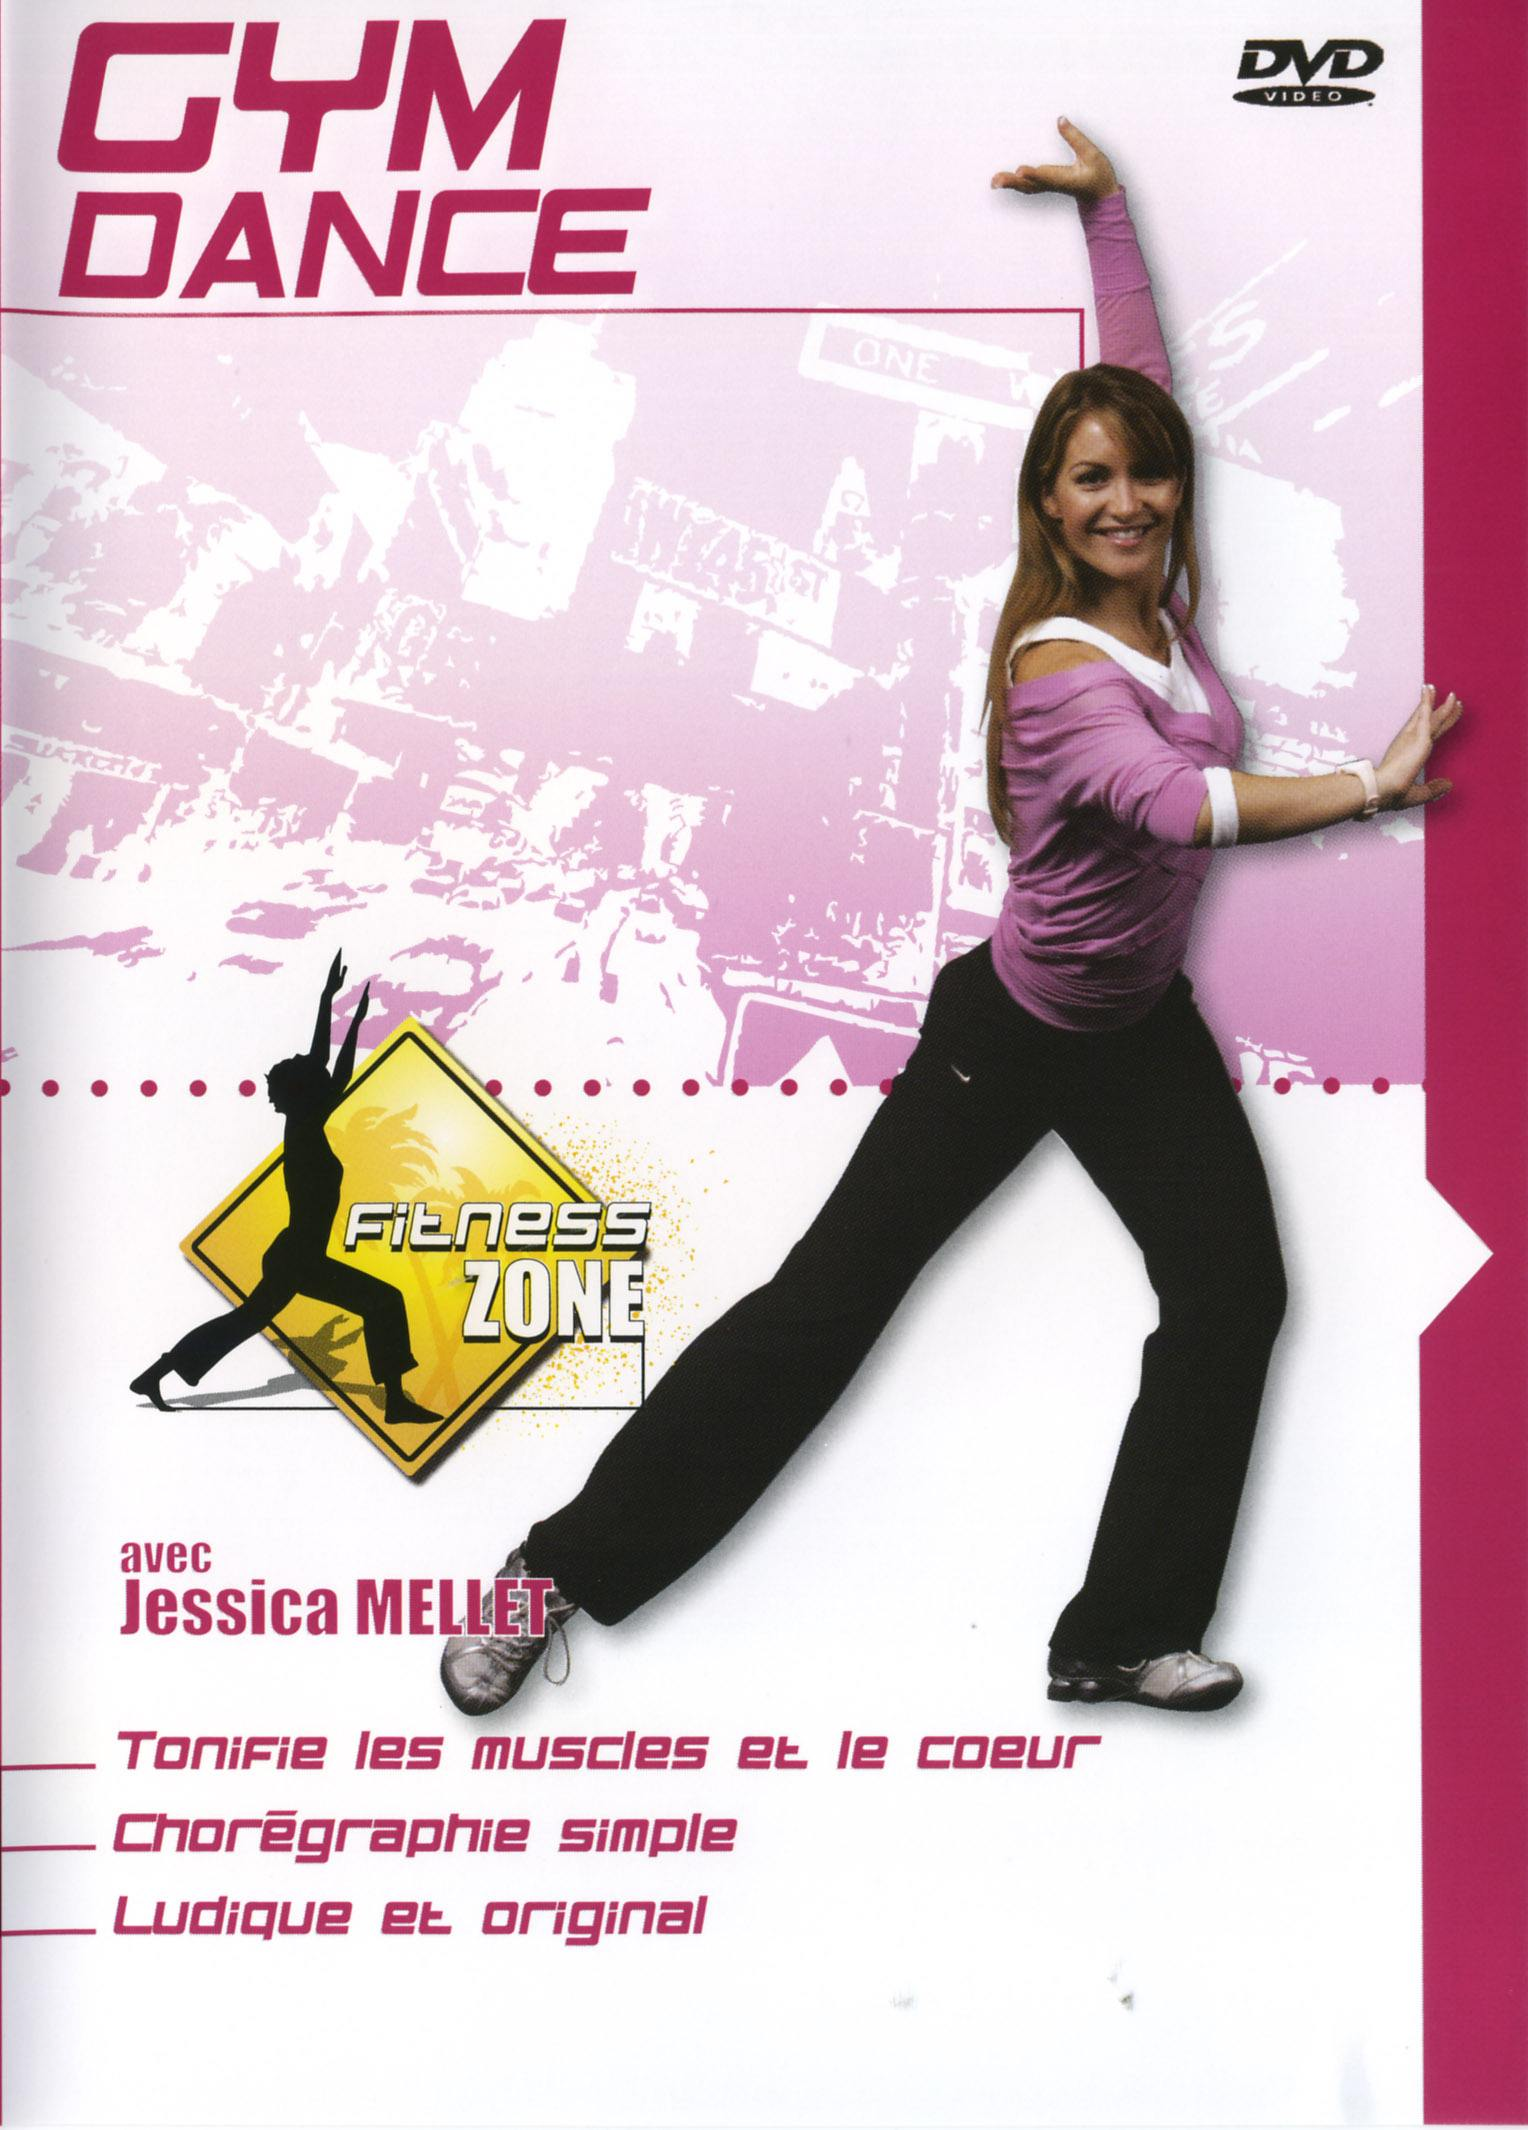 Gym dance vol 6 - dvd